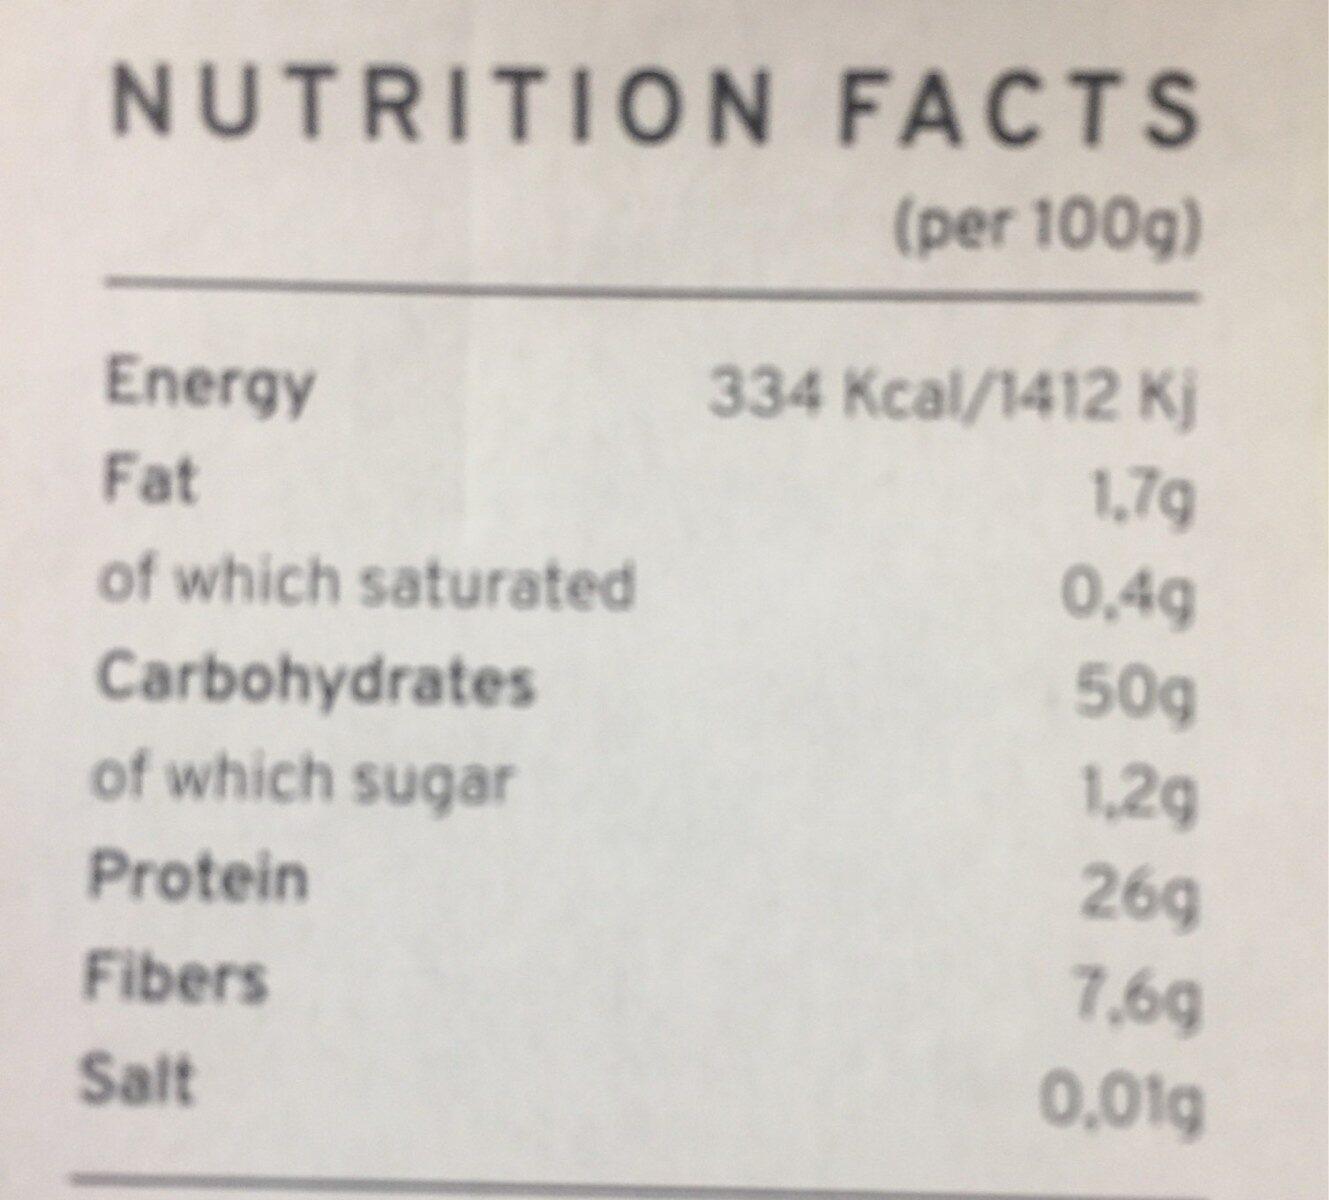 Red lentils pasta organic - Informations nutritionnelles - fr